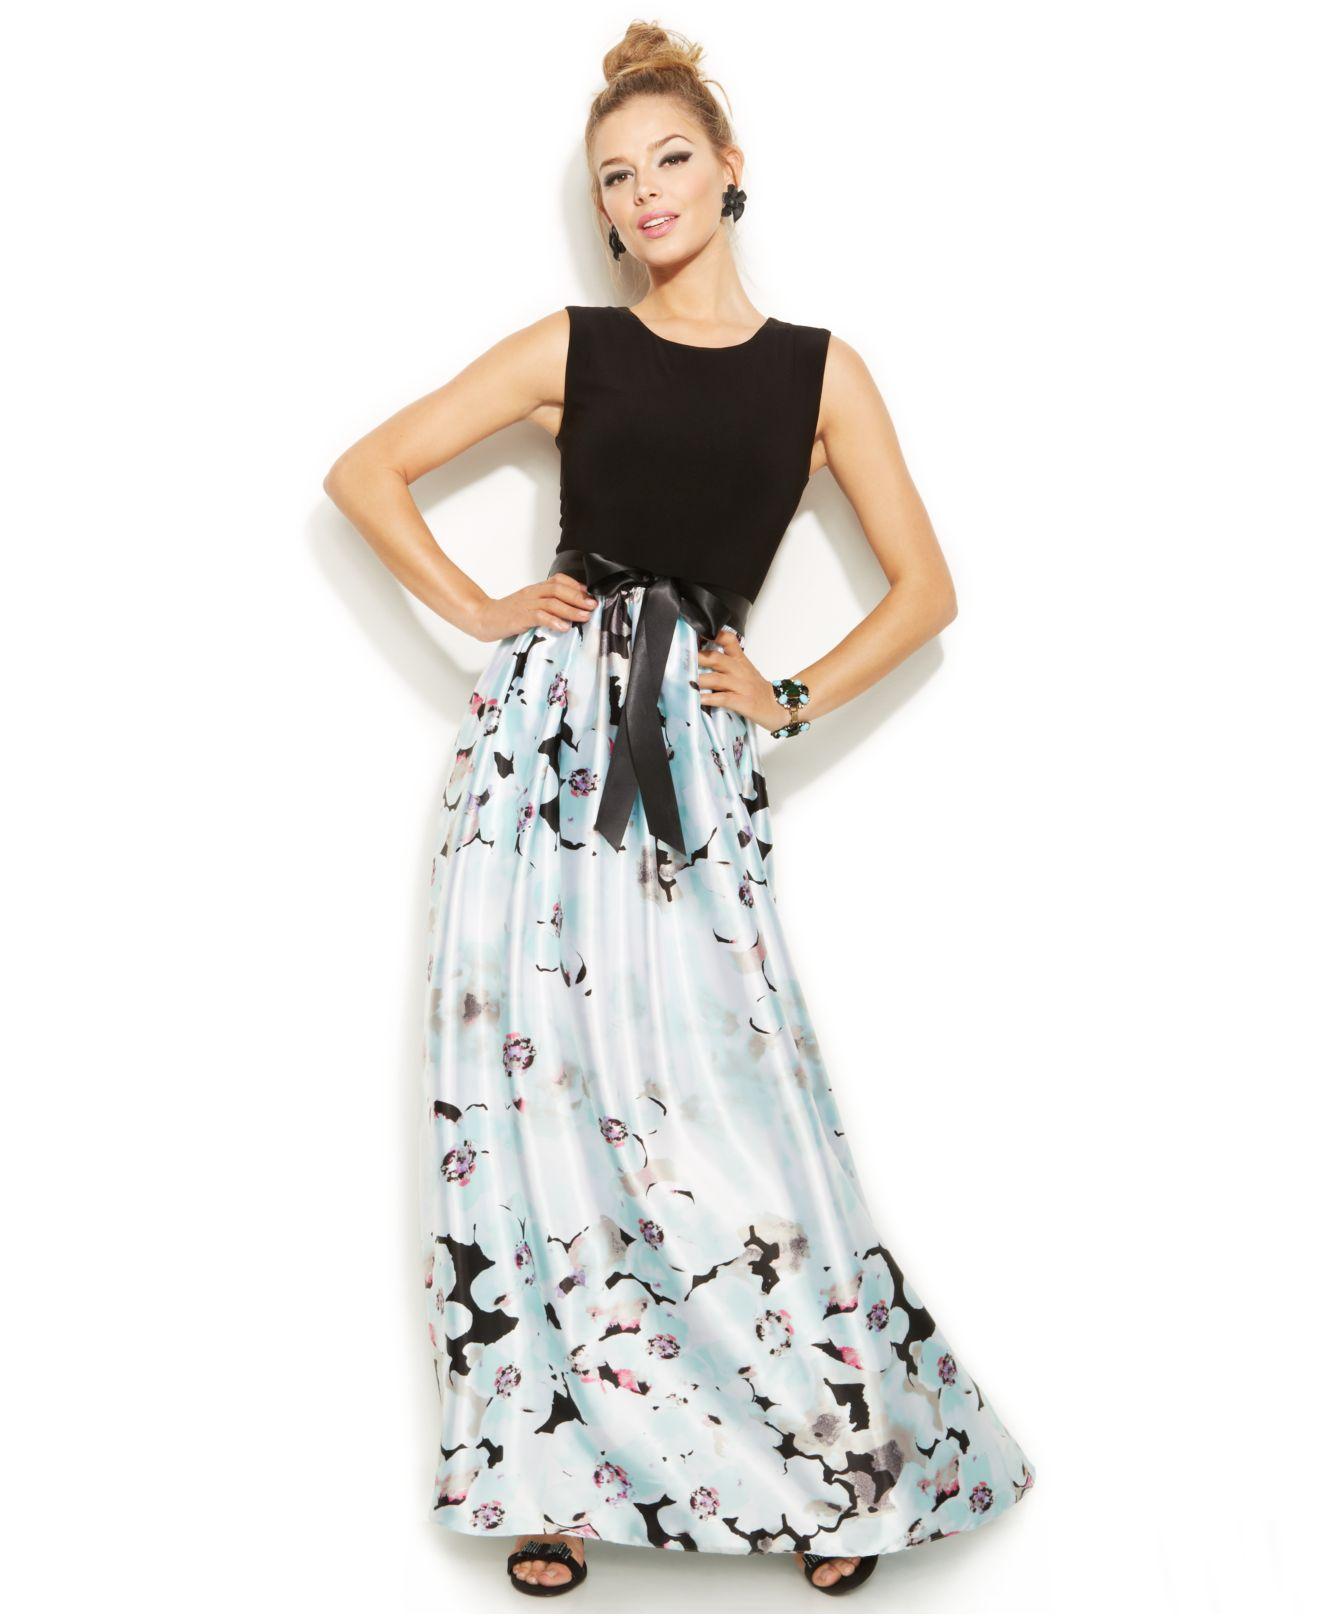 macys plus size prom dresses photo - 1